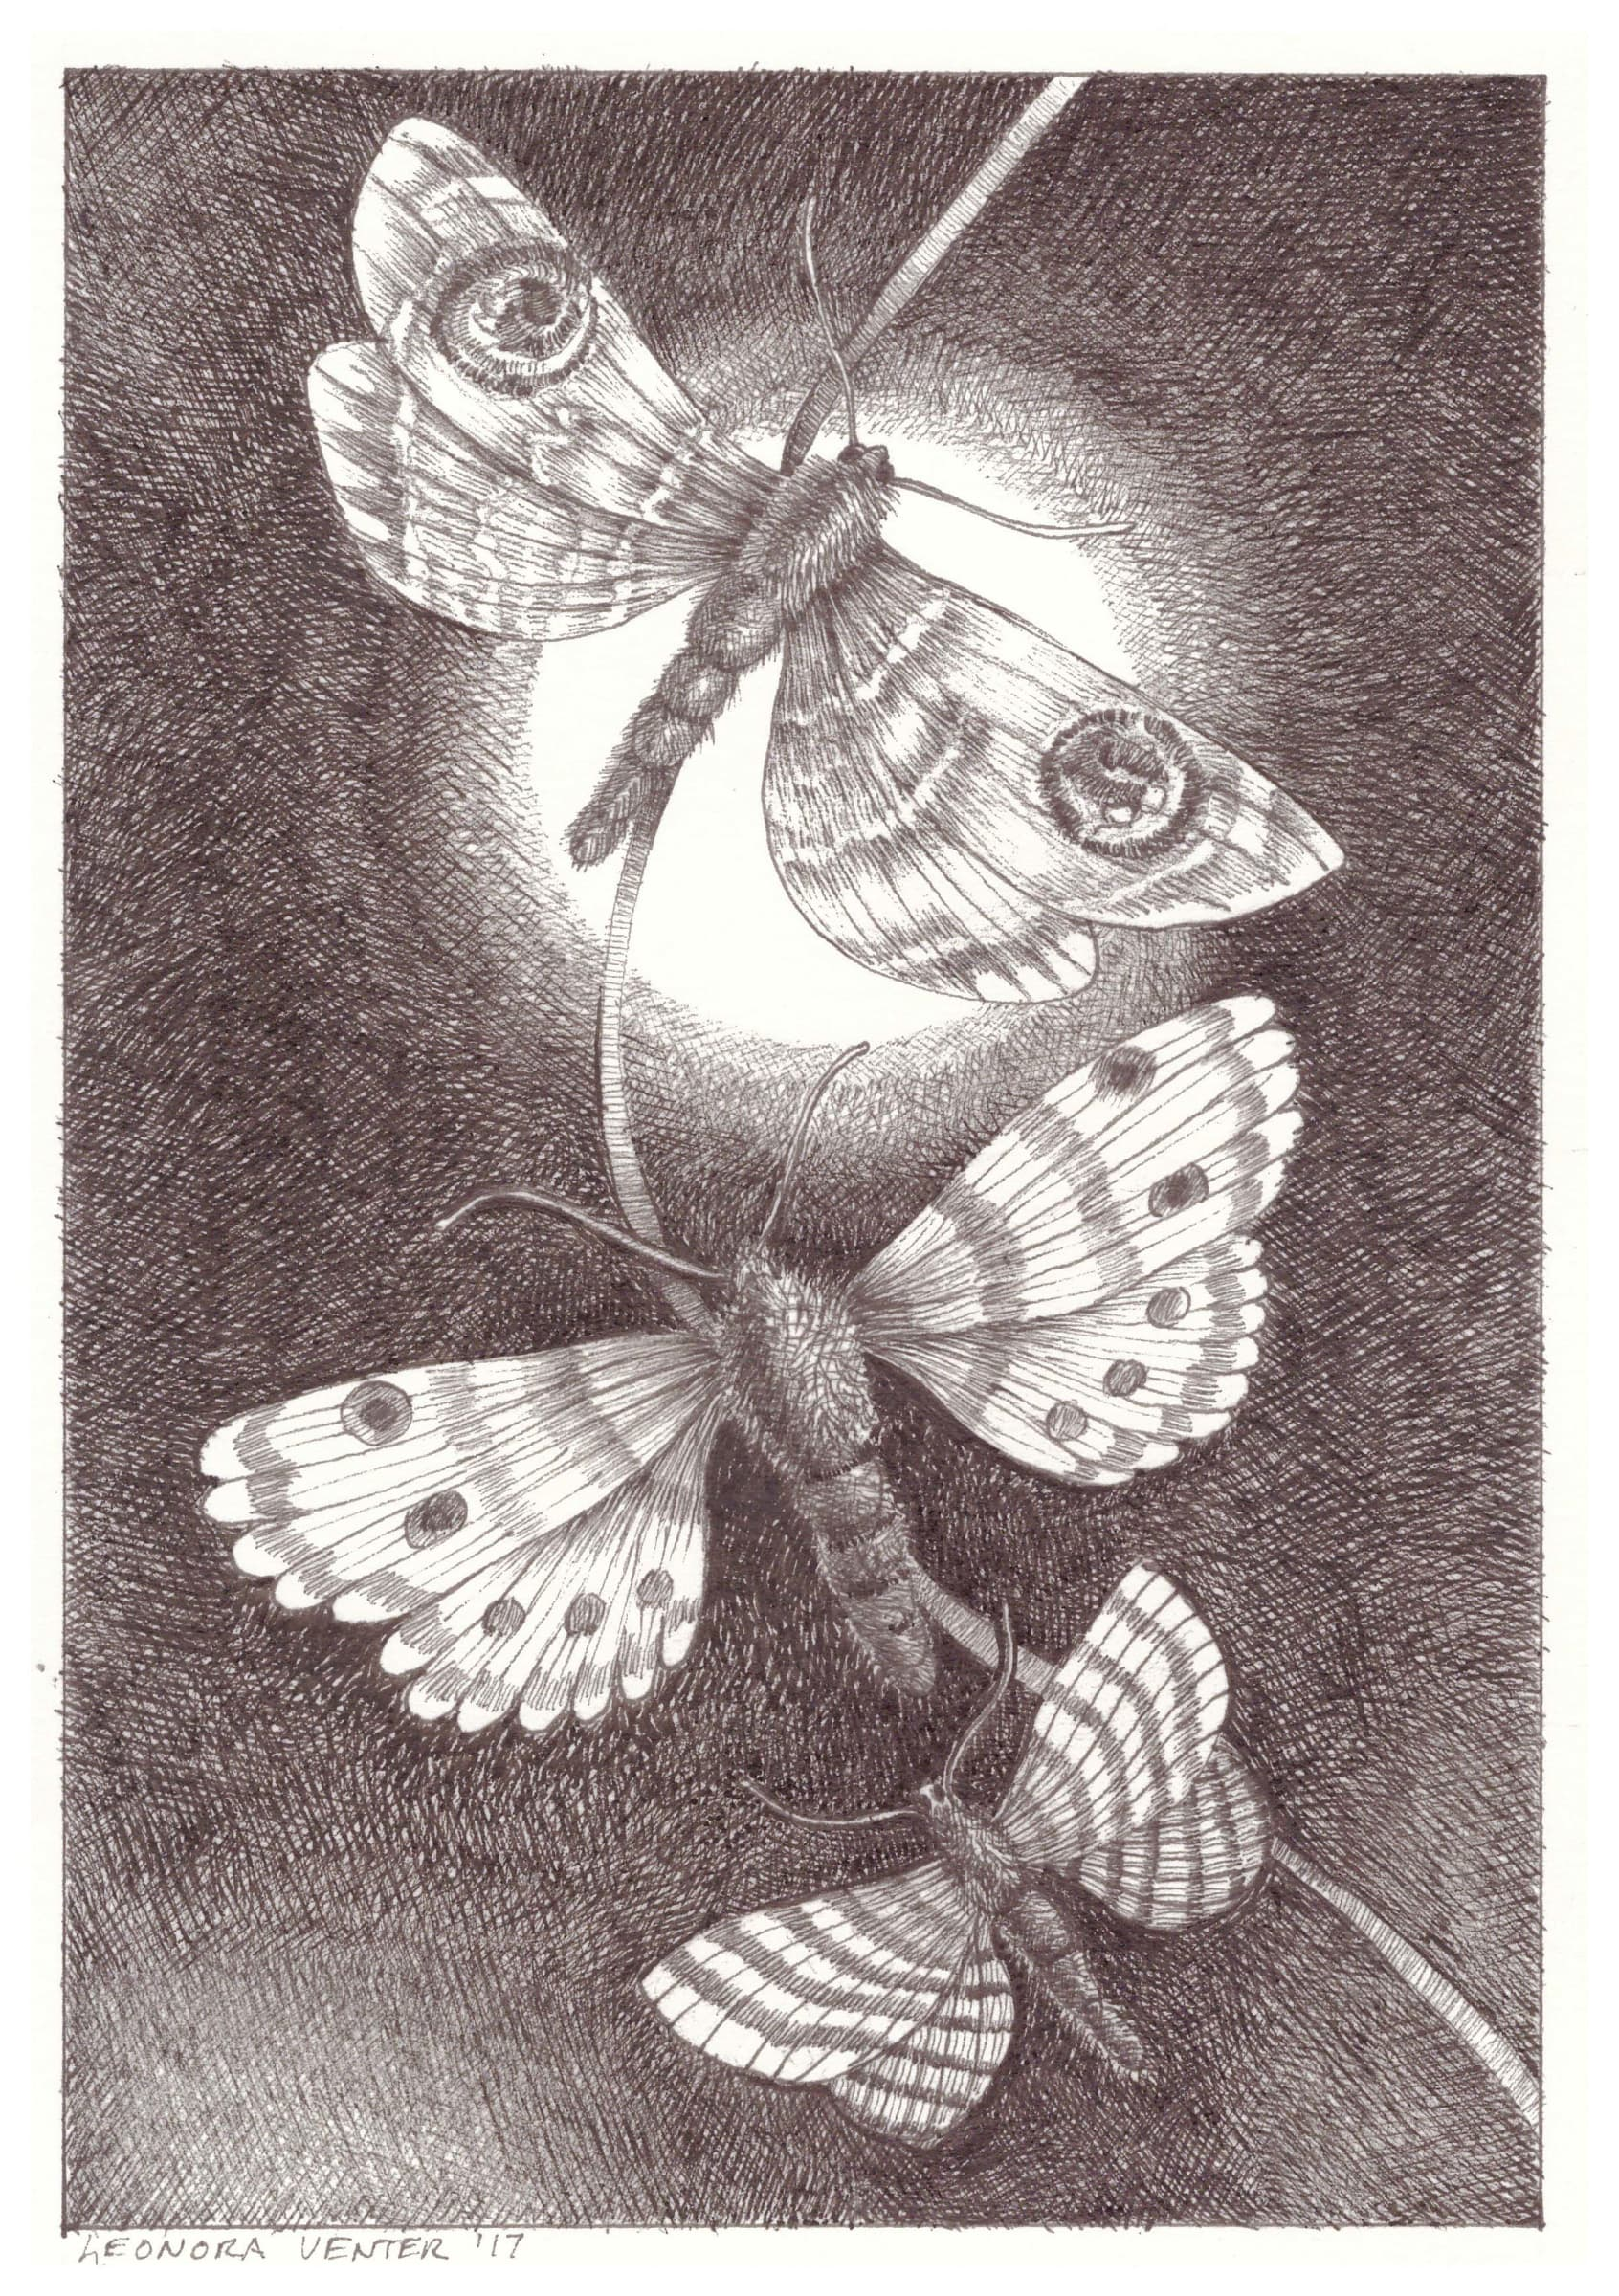 <span class=&#34;link fancybox-details-link&#34;><a href=&#34;/artists/71-leonora-venter/works/2266-leonora-venter-moths-2017/&#34;>View Detail Page</a></span><div class=&#34;artist&#34;><strong>Leonora Venter</strong></div> <div class=&#34;title&#34;><em>Moths</em>, 2017</div> <div class=&#34;medium&#34;>Ink On Paper</div> <div class=&#34;dimensions&#34;>14.5cm x 10.5cm</div><div class=&#34;price&#34;>R600.00</div>